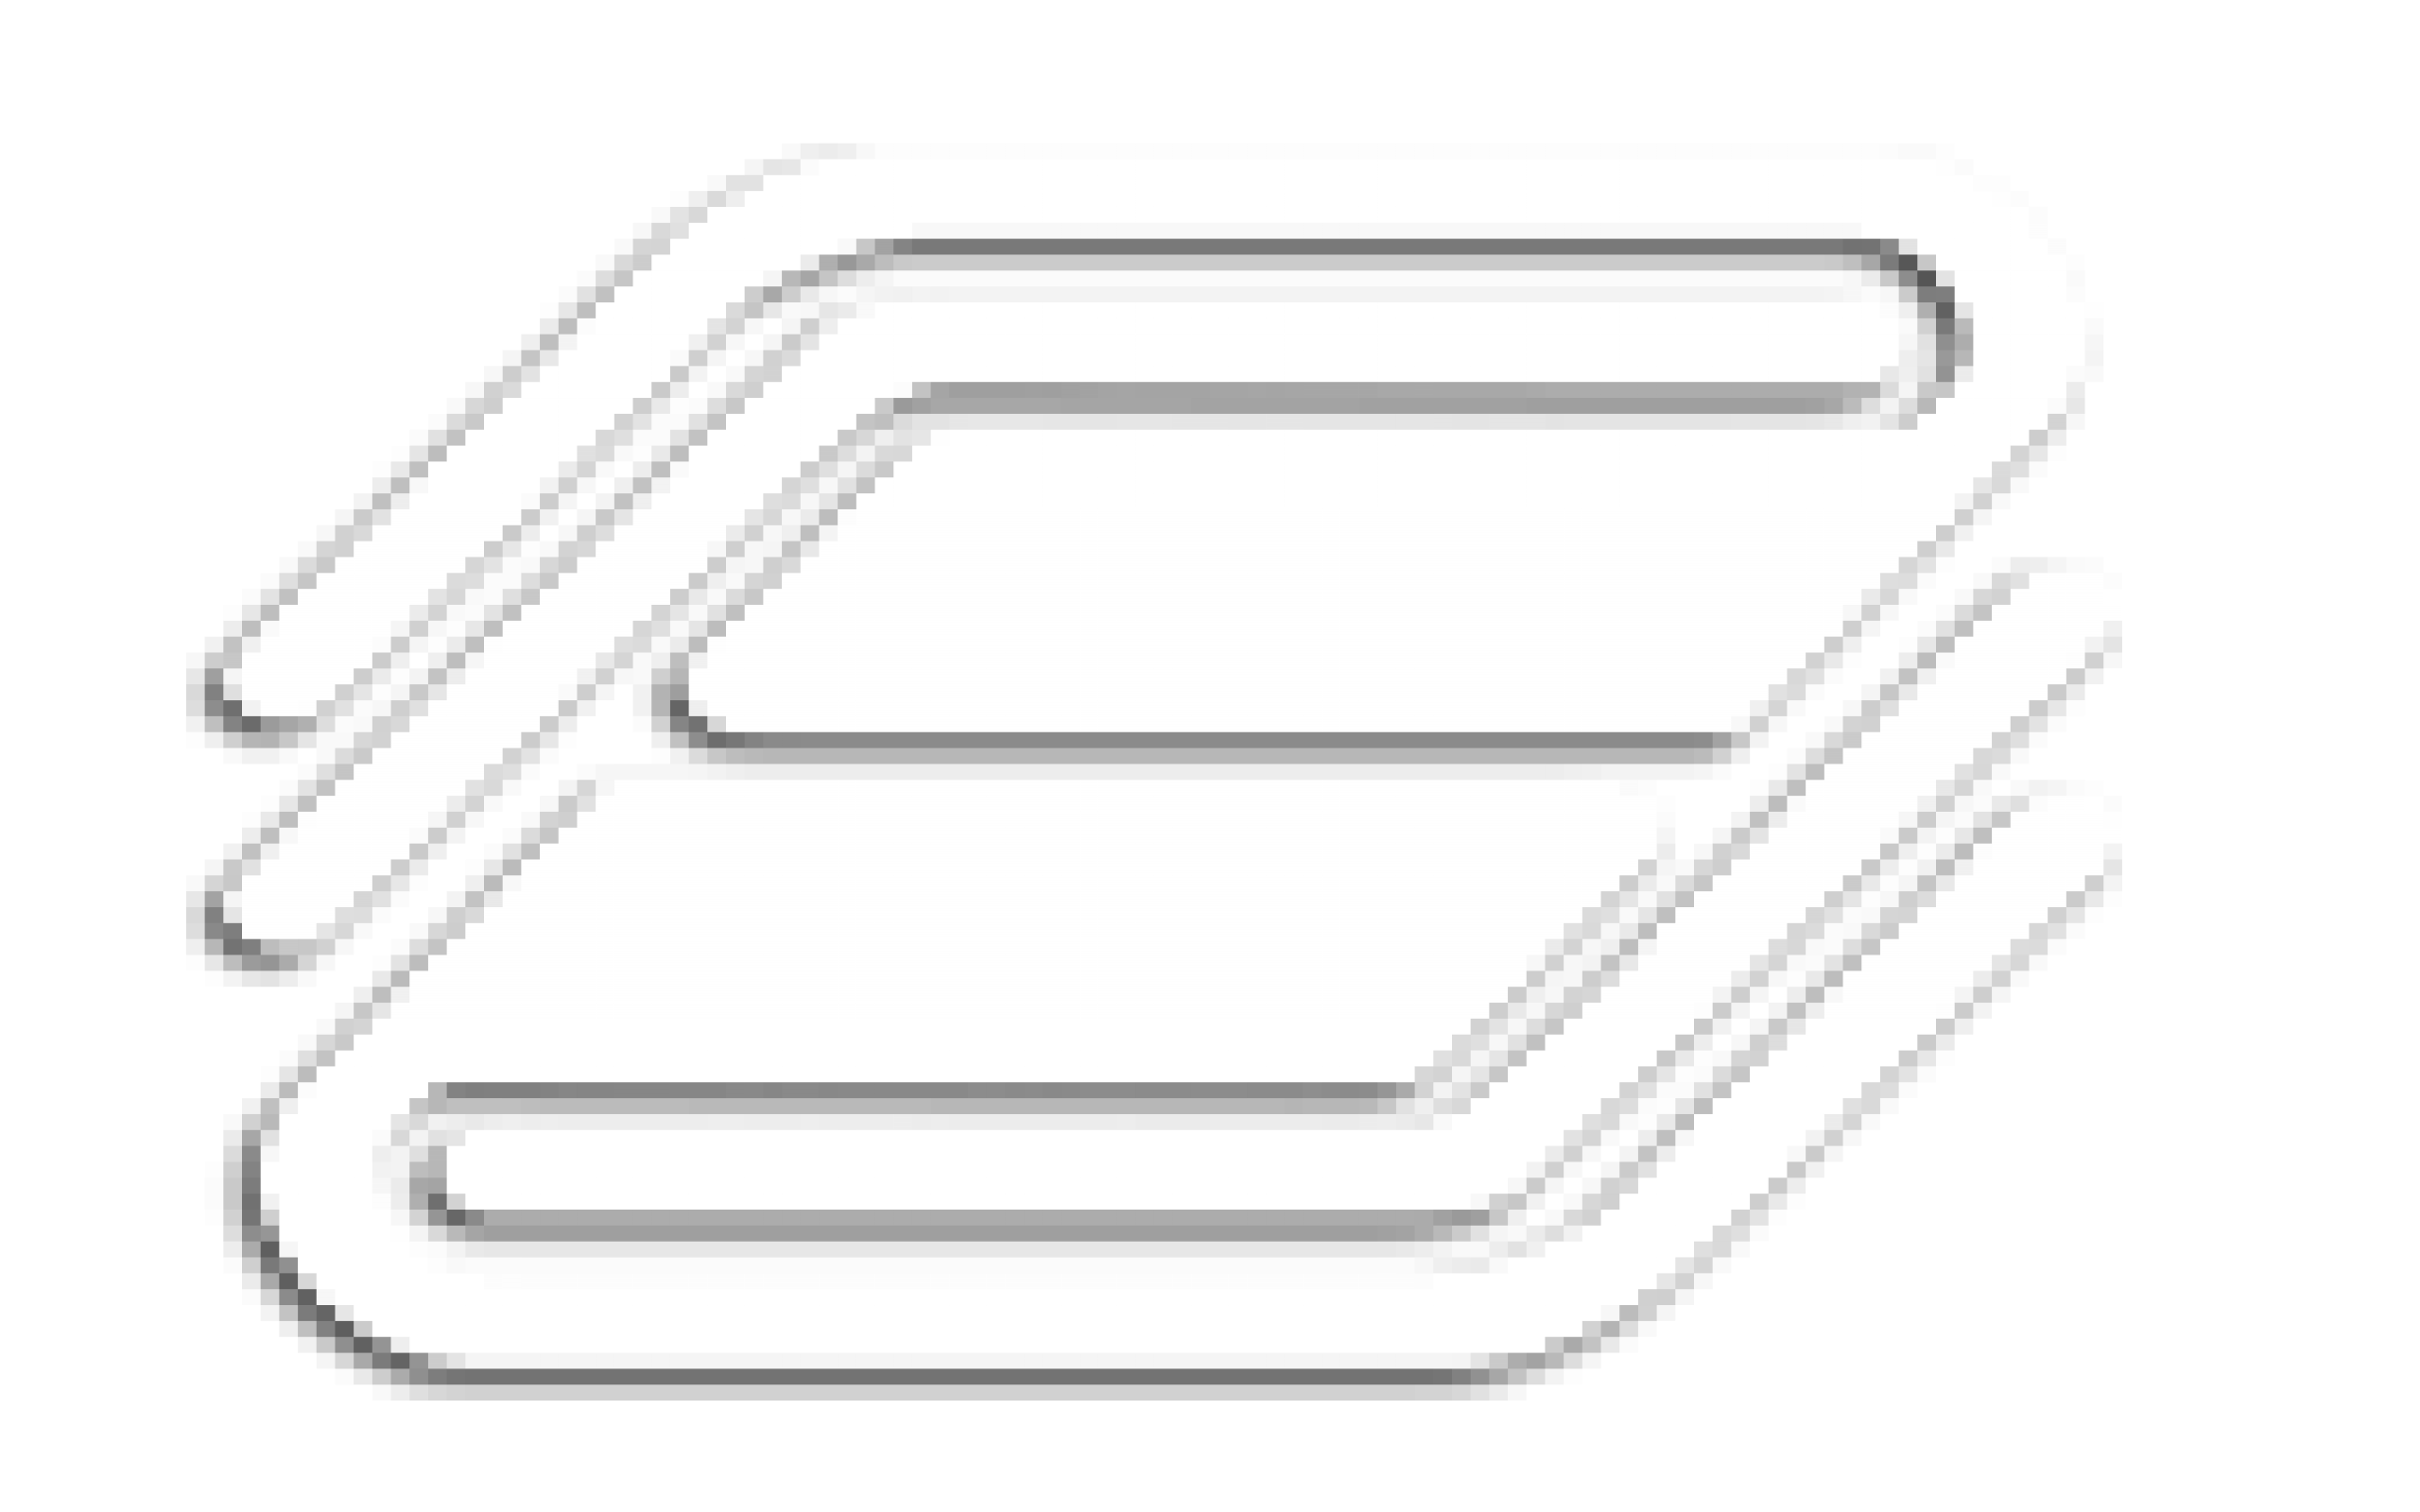 guu_logo_kopia.png